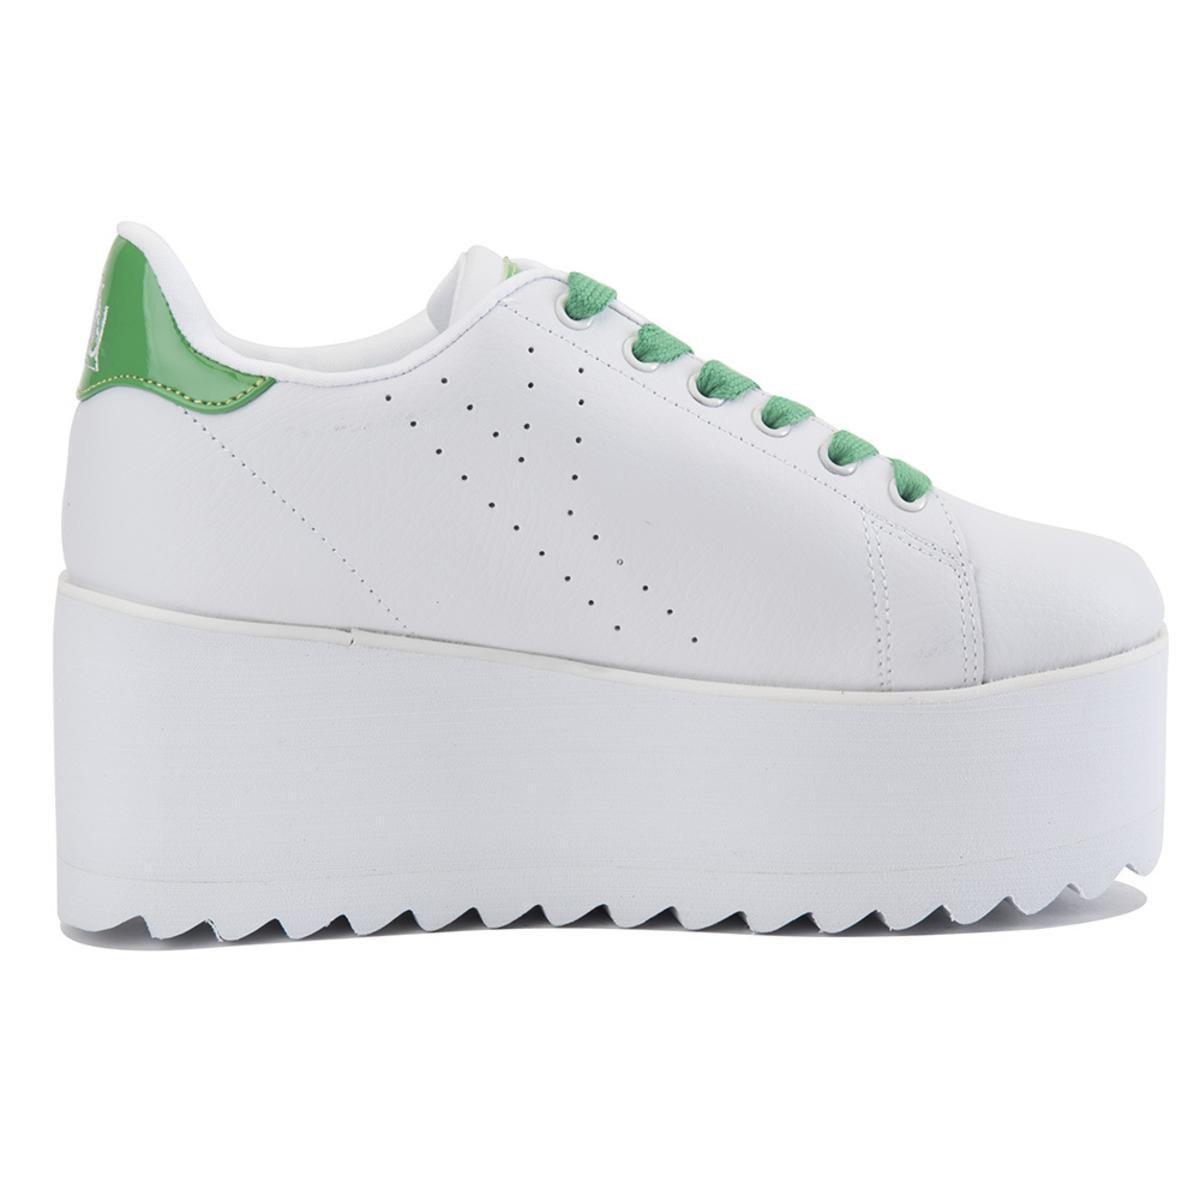 YRU Leather Lala White Green Platform